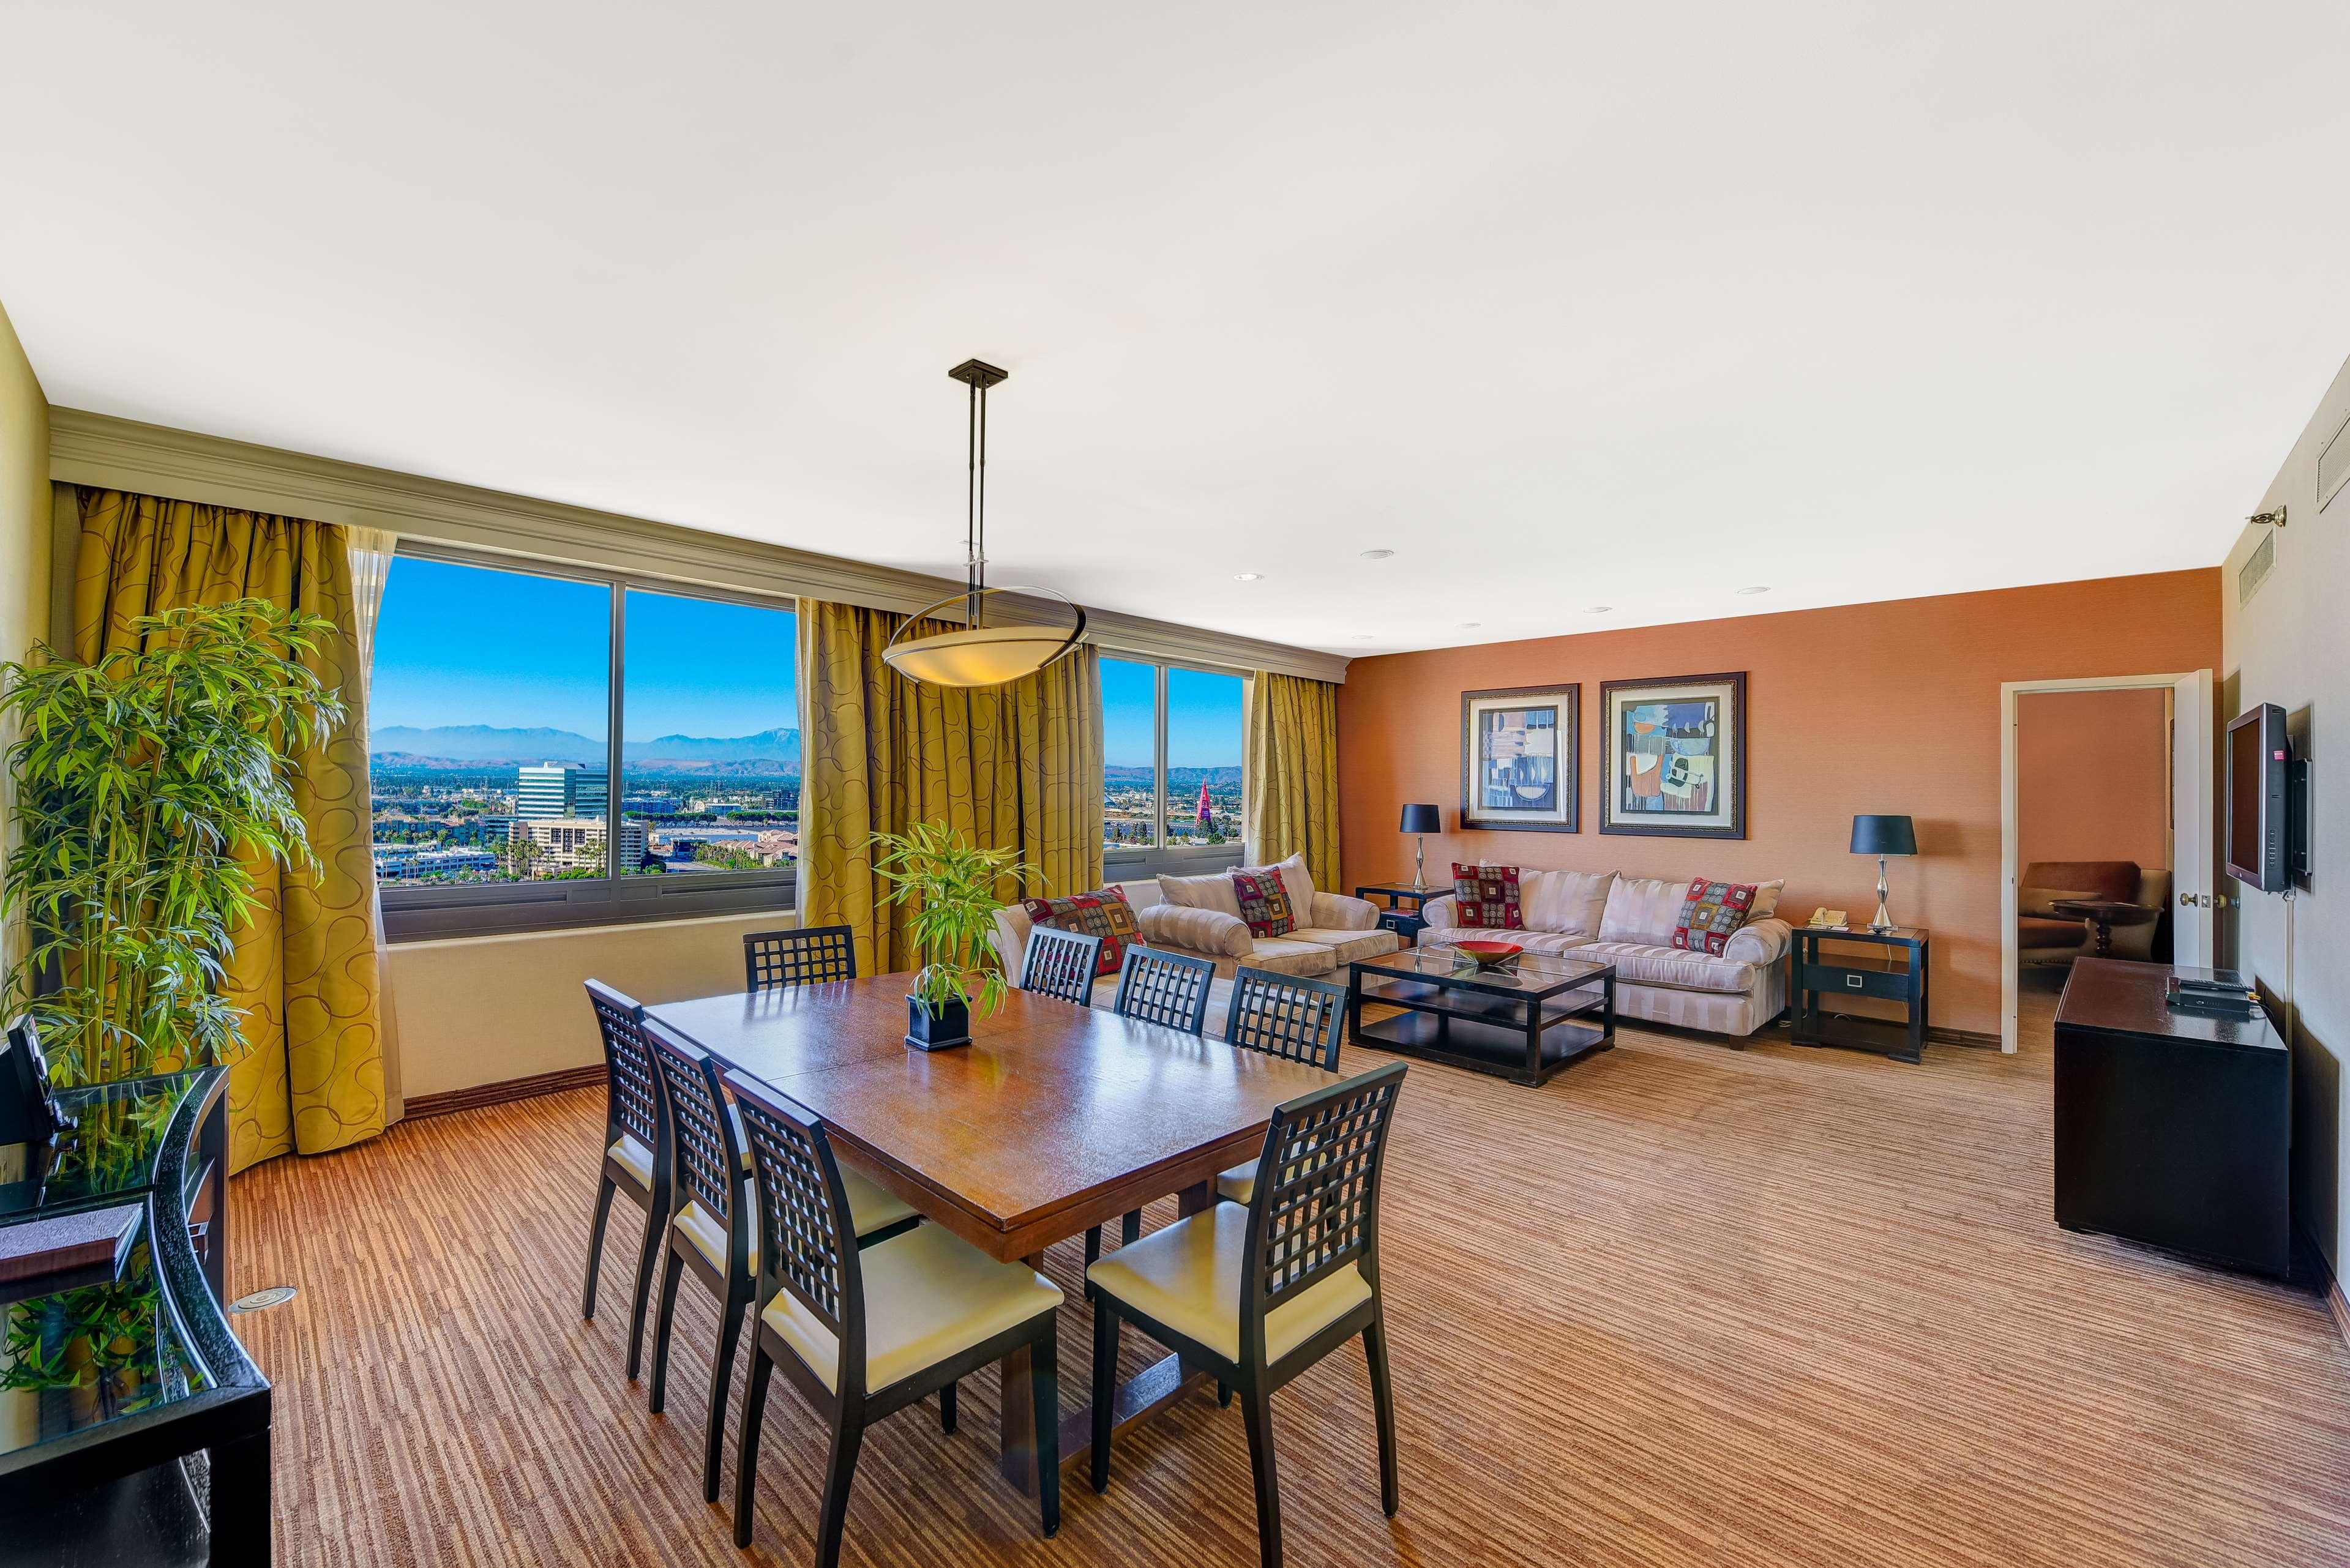 DoubleTree by Hilton Hotel Anaheim - Orange County image 39